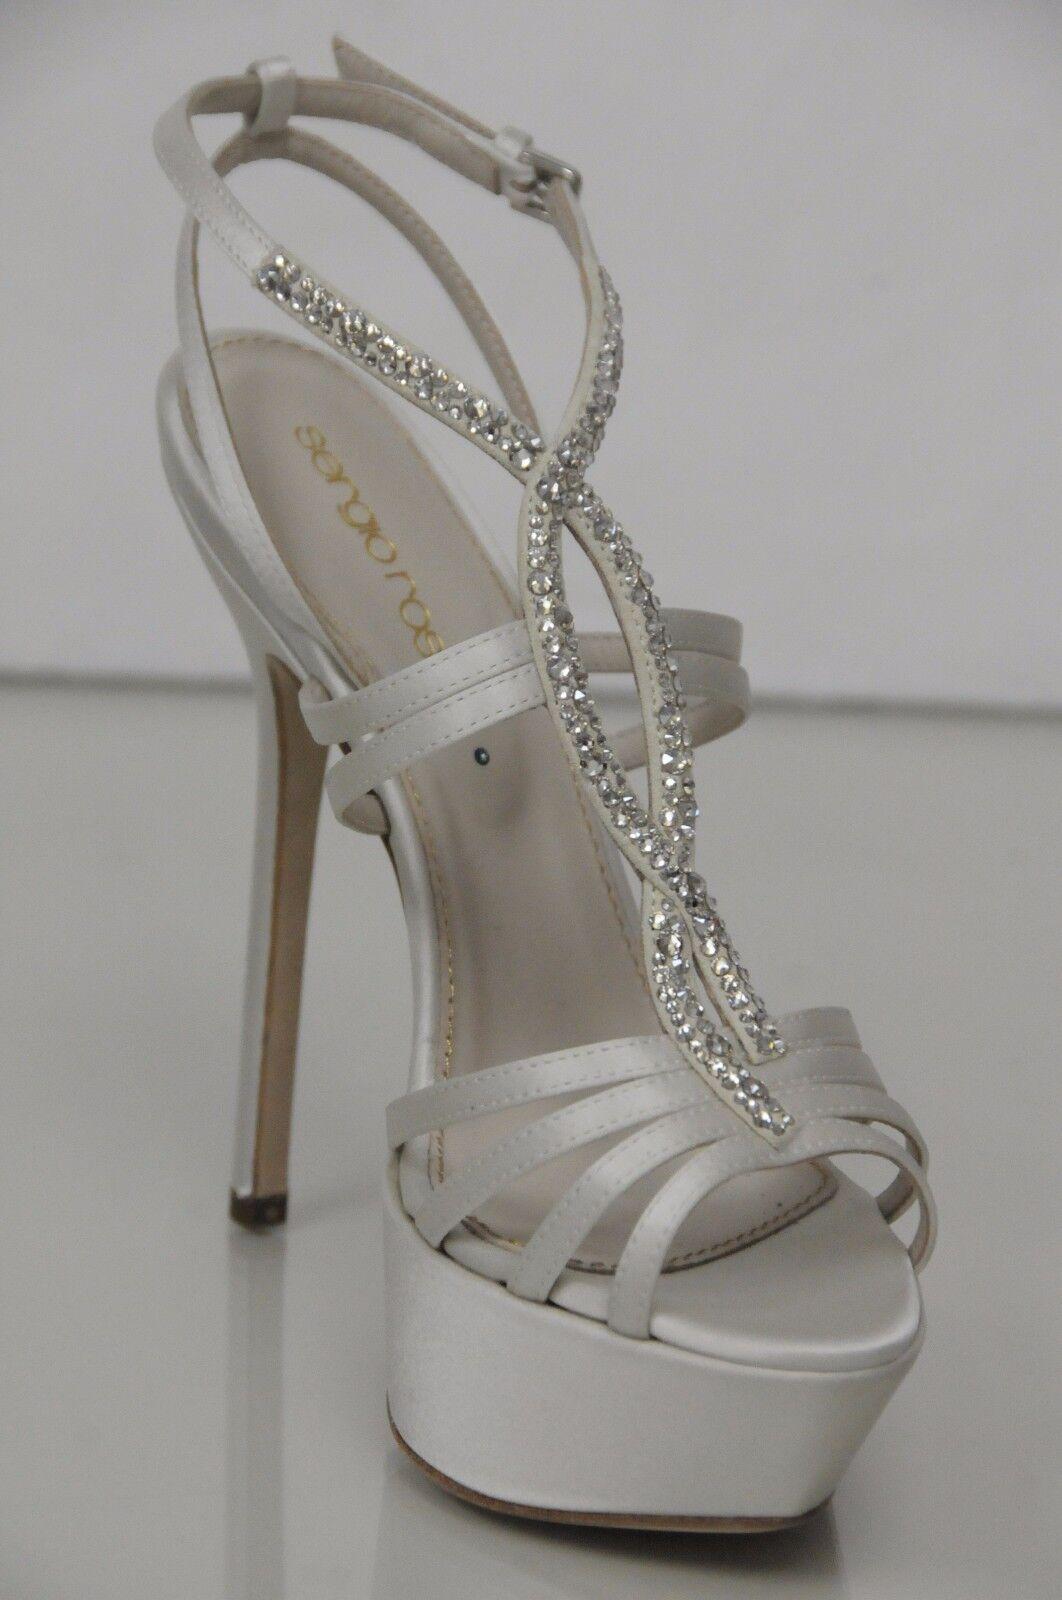 875 New Sergio Crystals Rossi Ivory Satin STRASS Crystals Sergio Wedding Bridal Platform Shoes c748f4